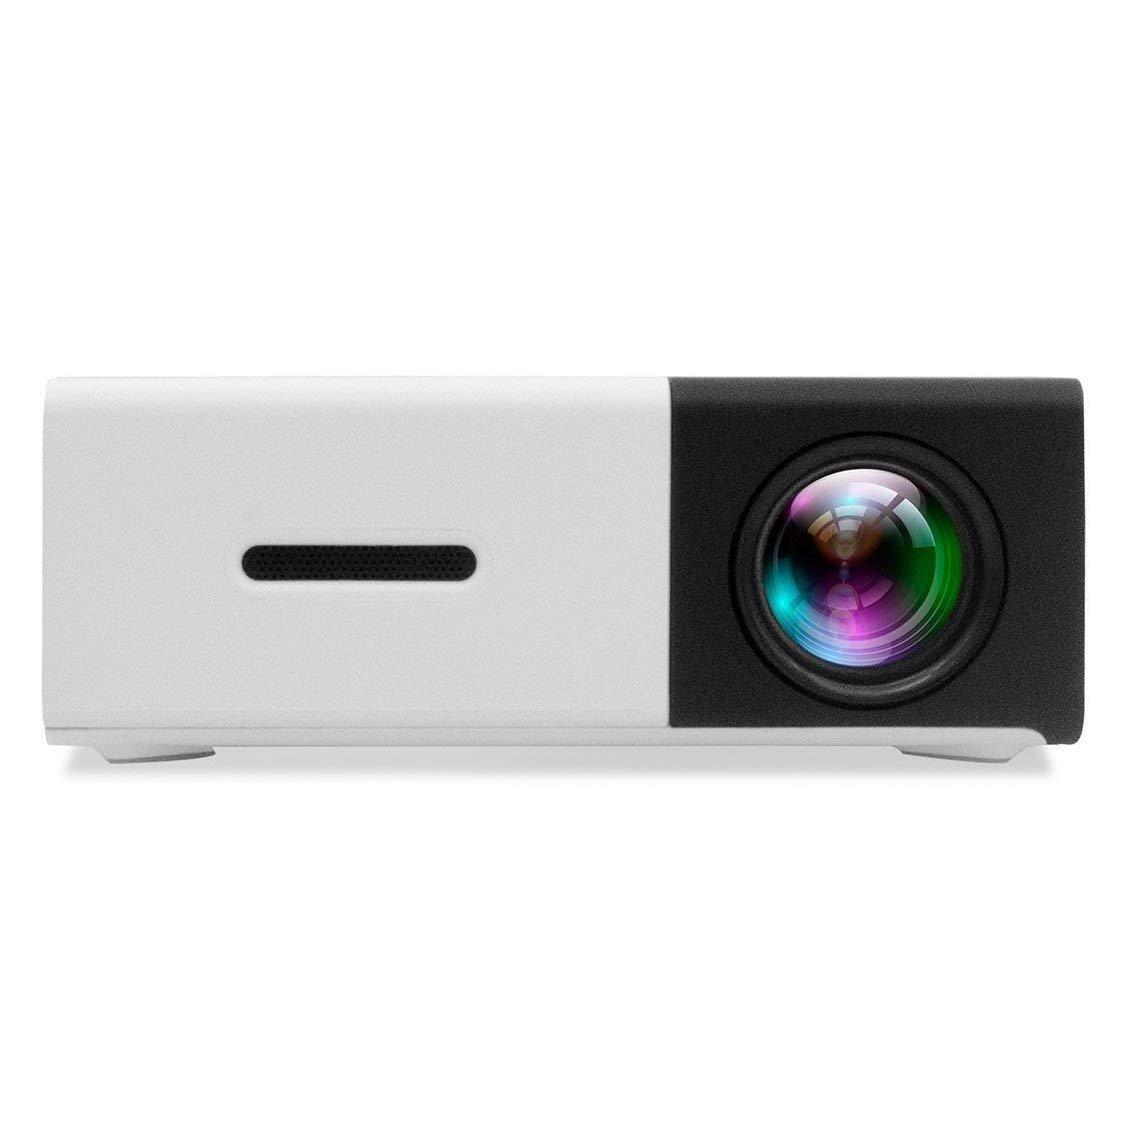 YOMRIC Proyector Mini-proyector DP300, proyector LED portátil Cine ...